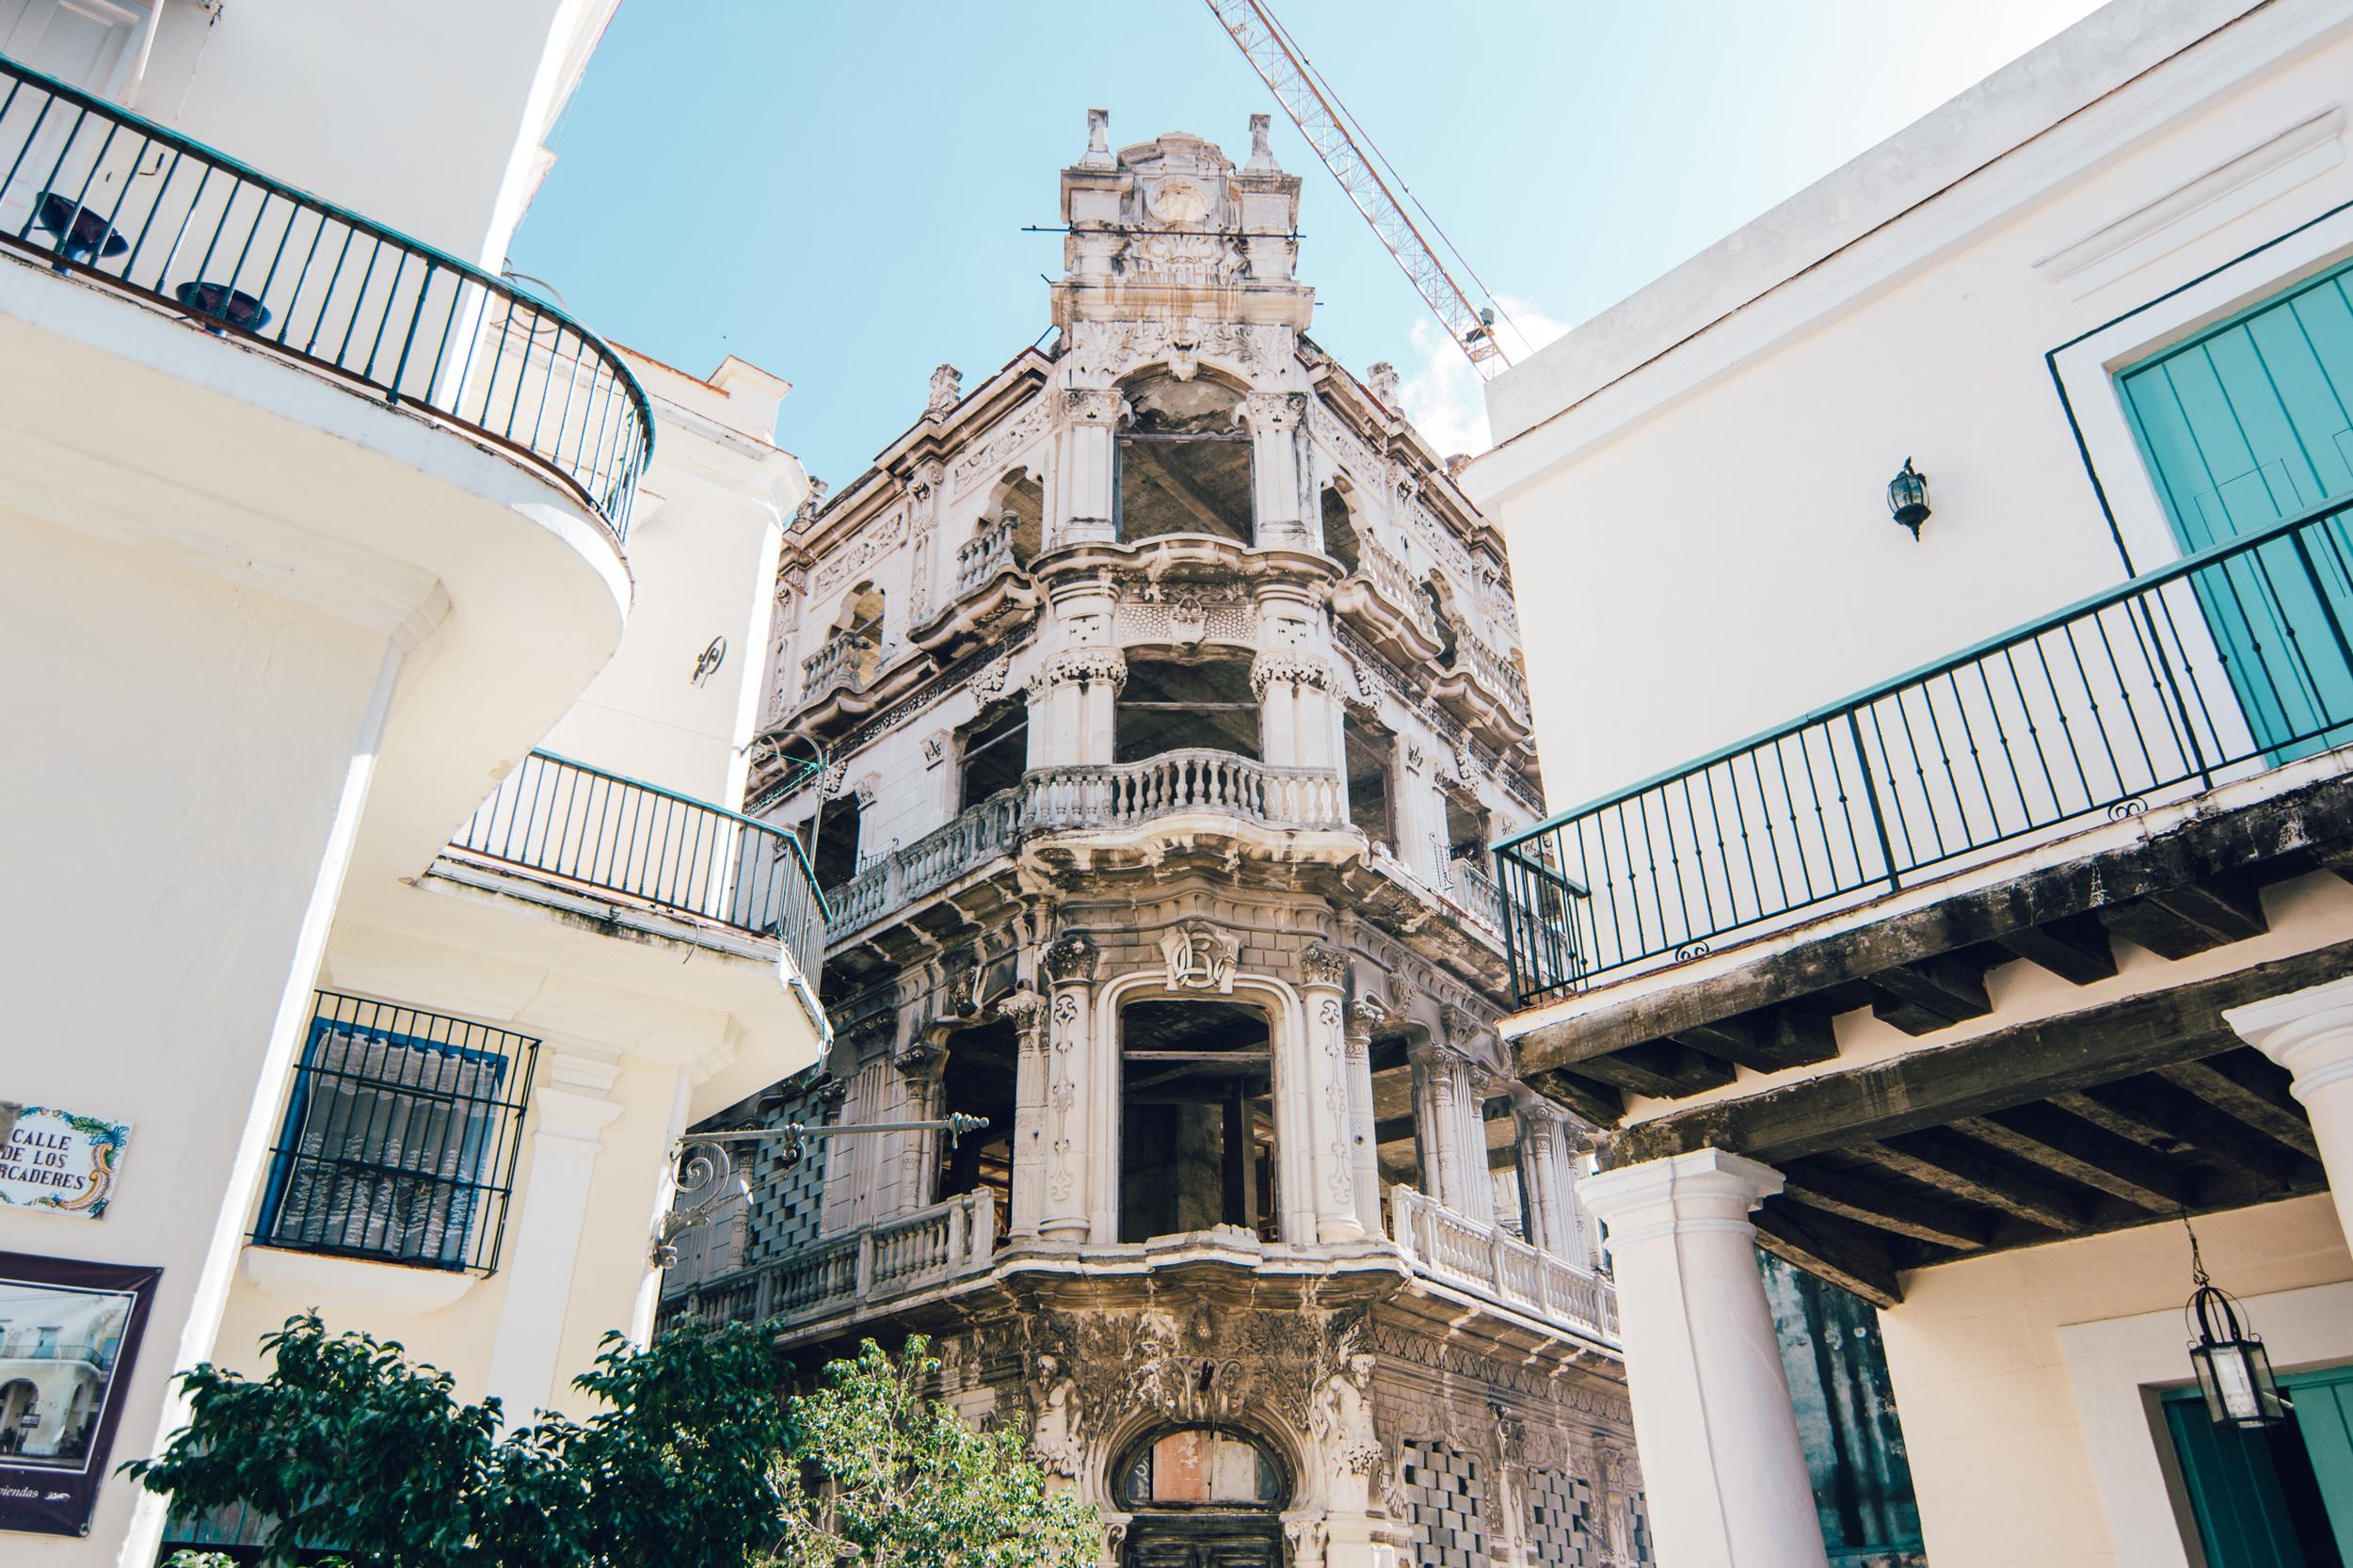 DeClaro-Photography-Cuba-02340.jpg